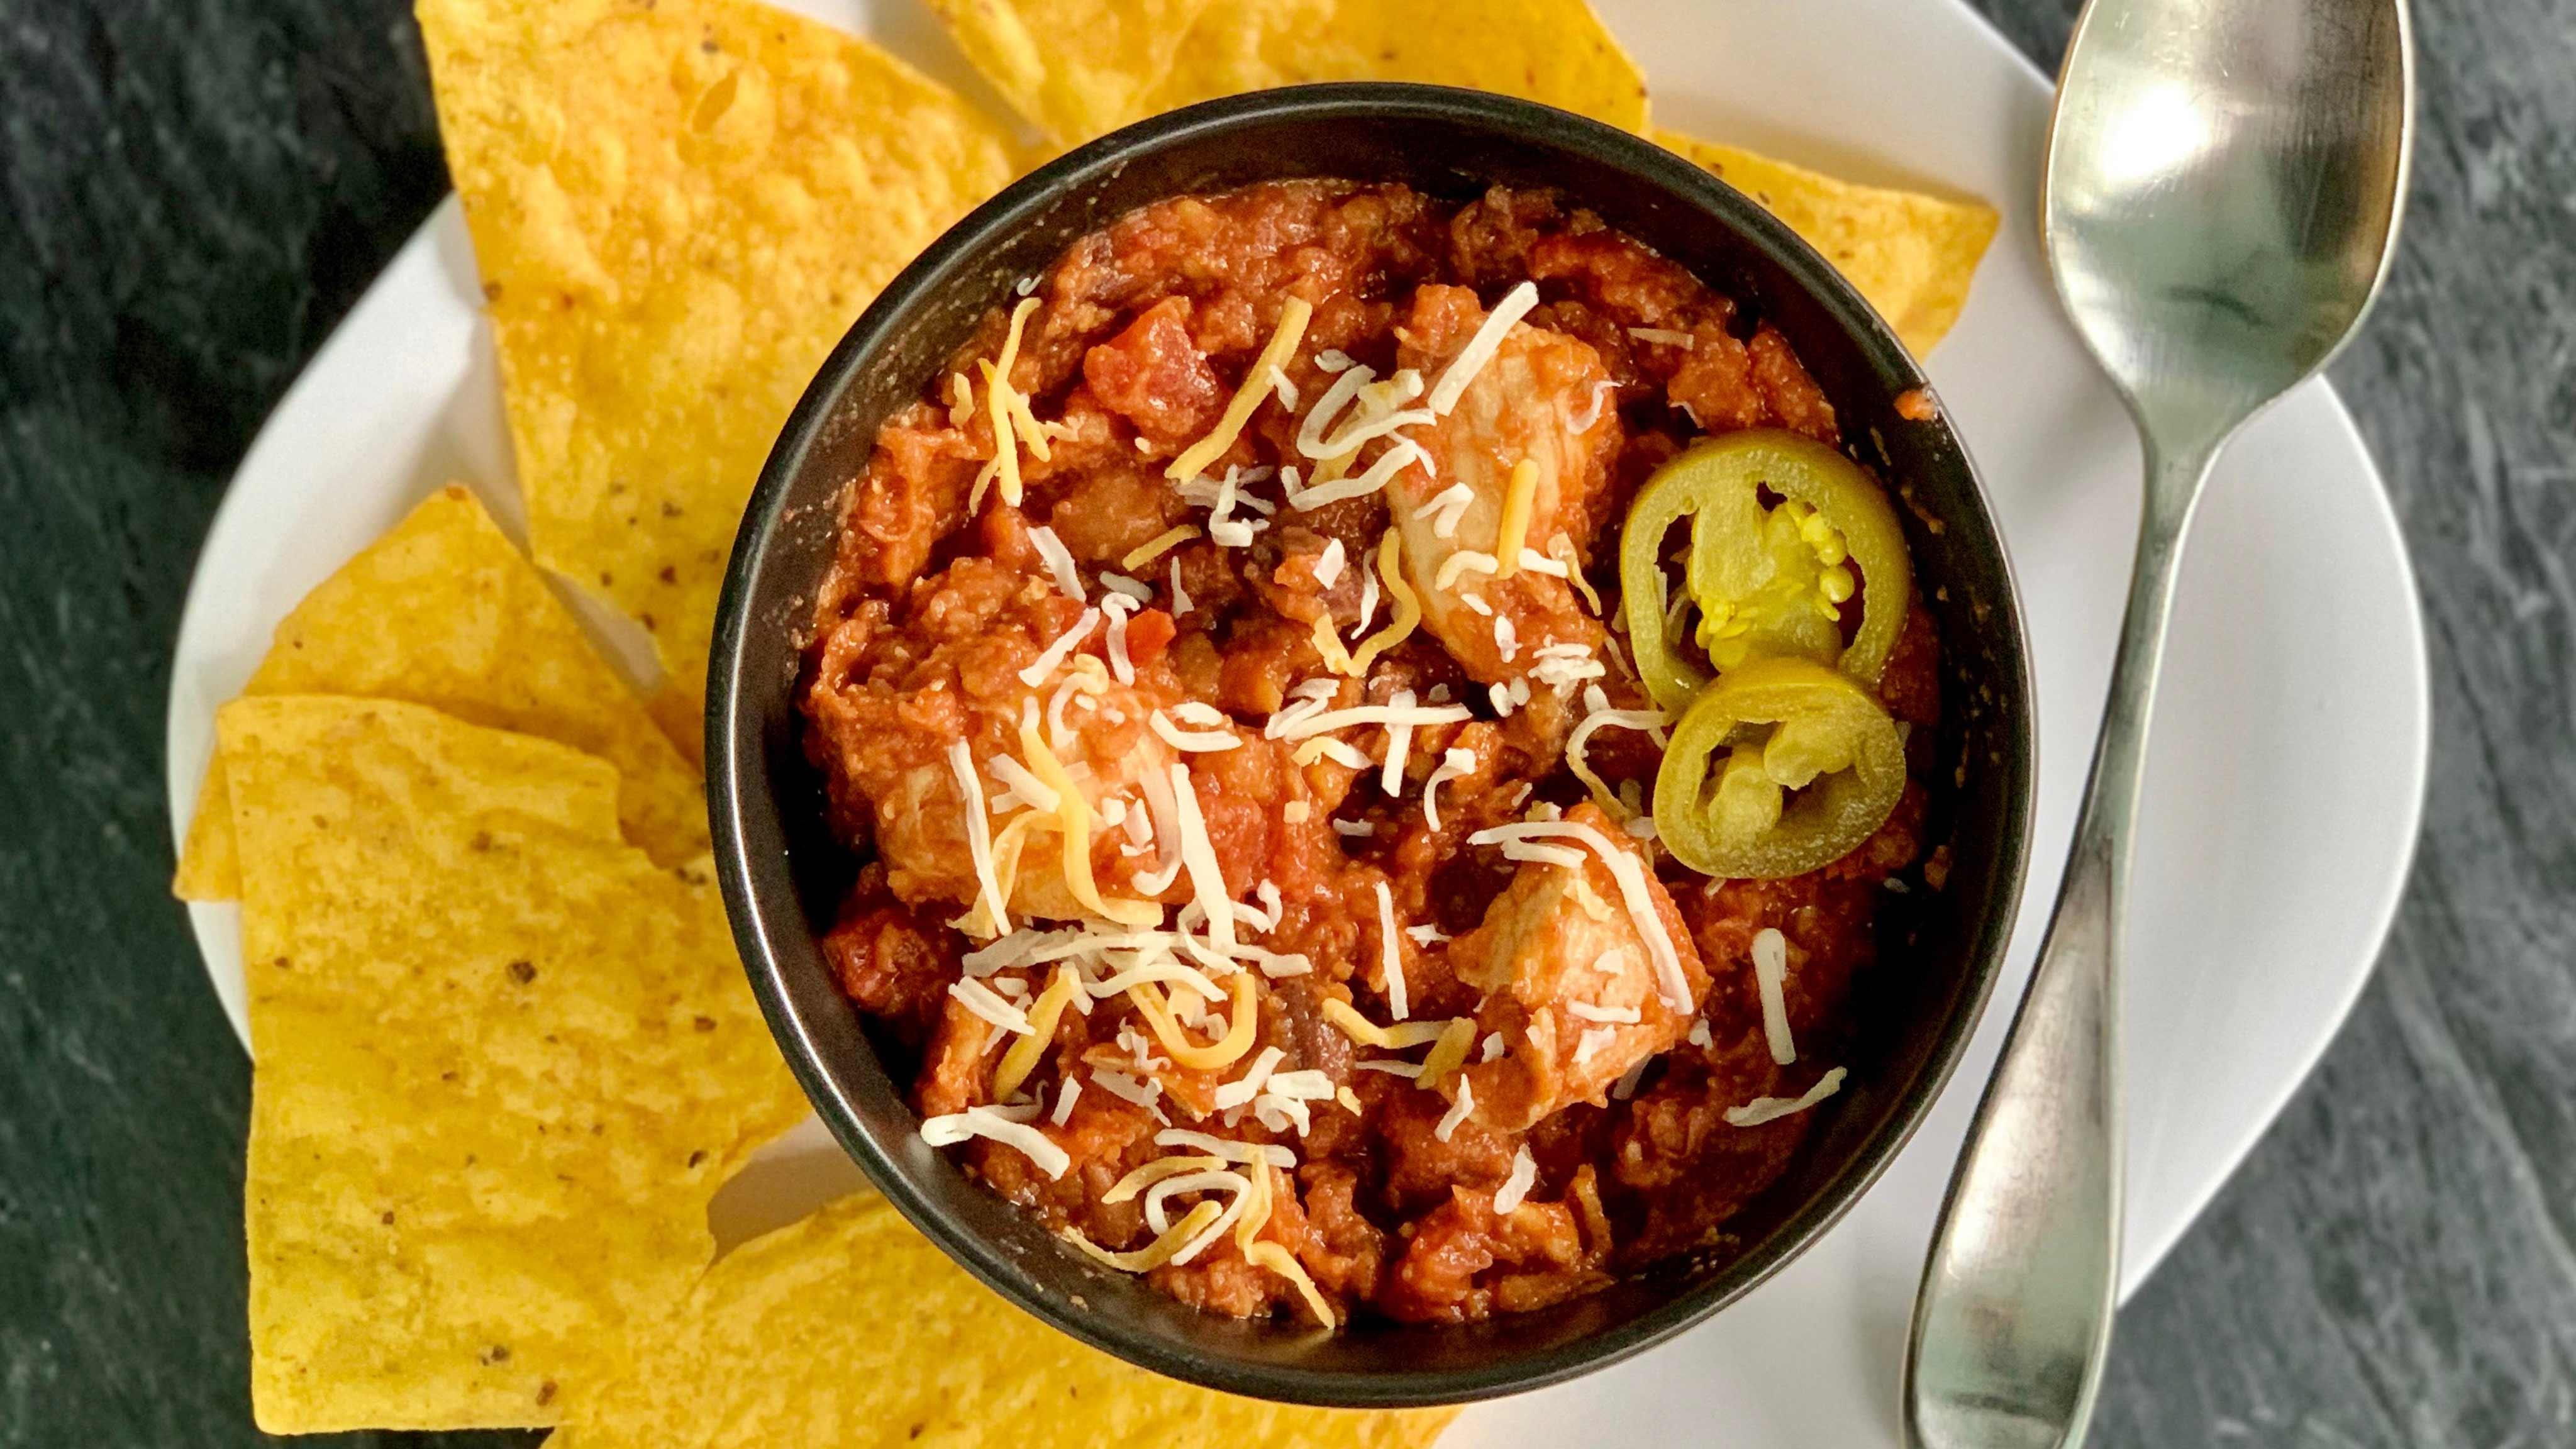 Image for Recipe Skillet Chicken Chili